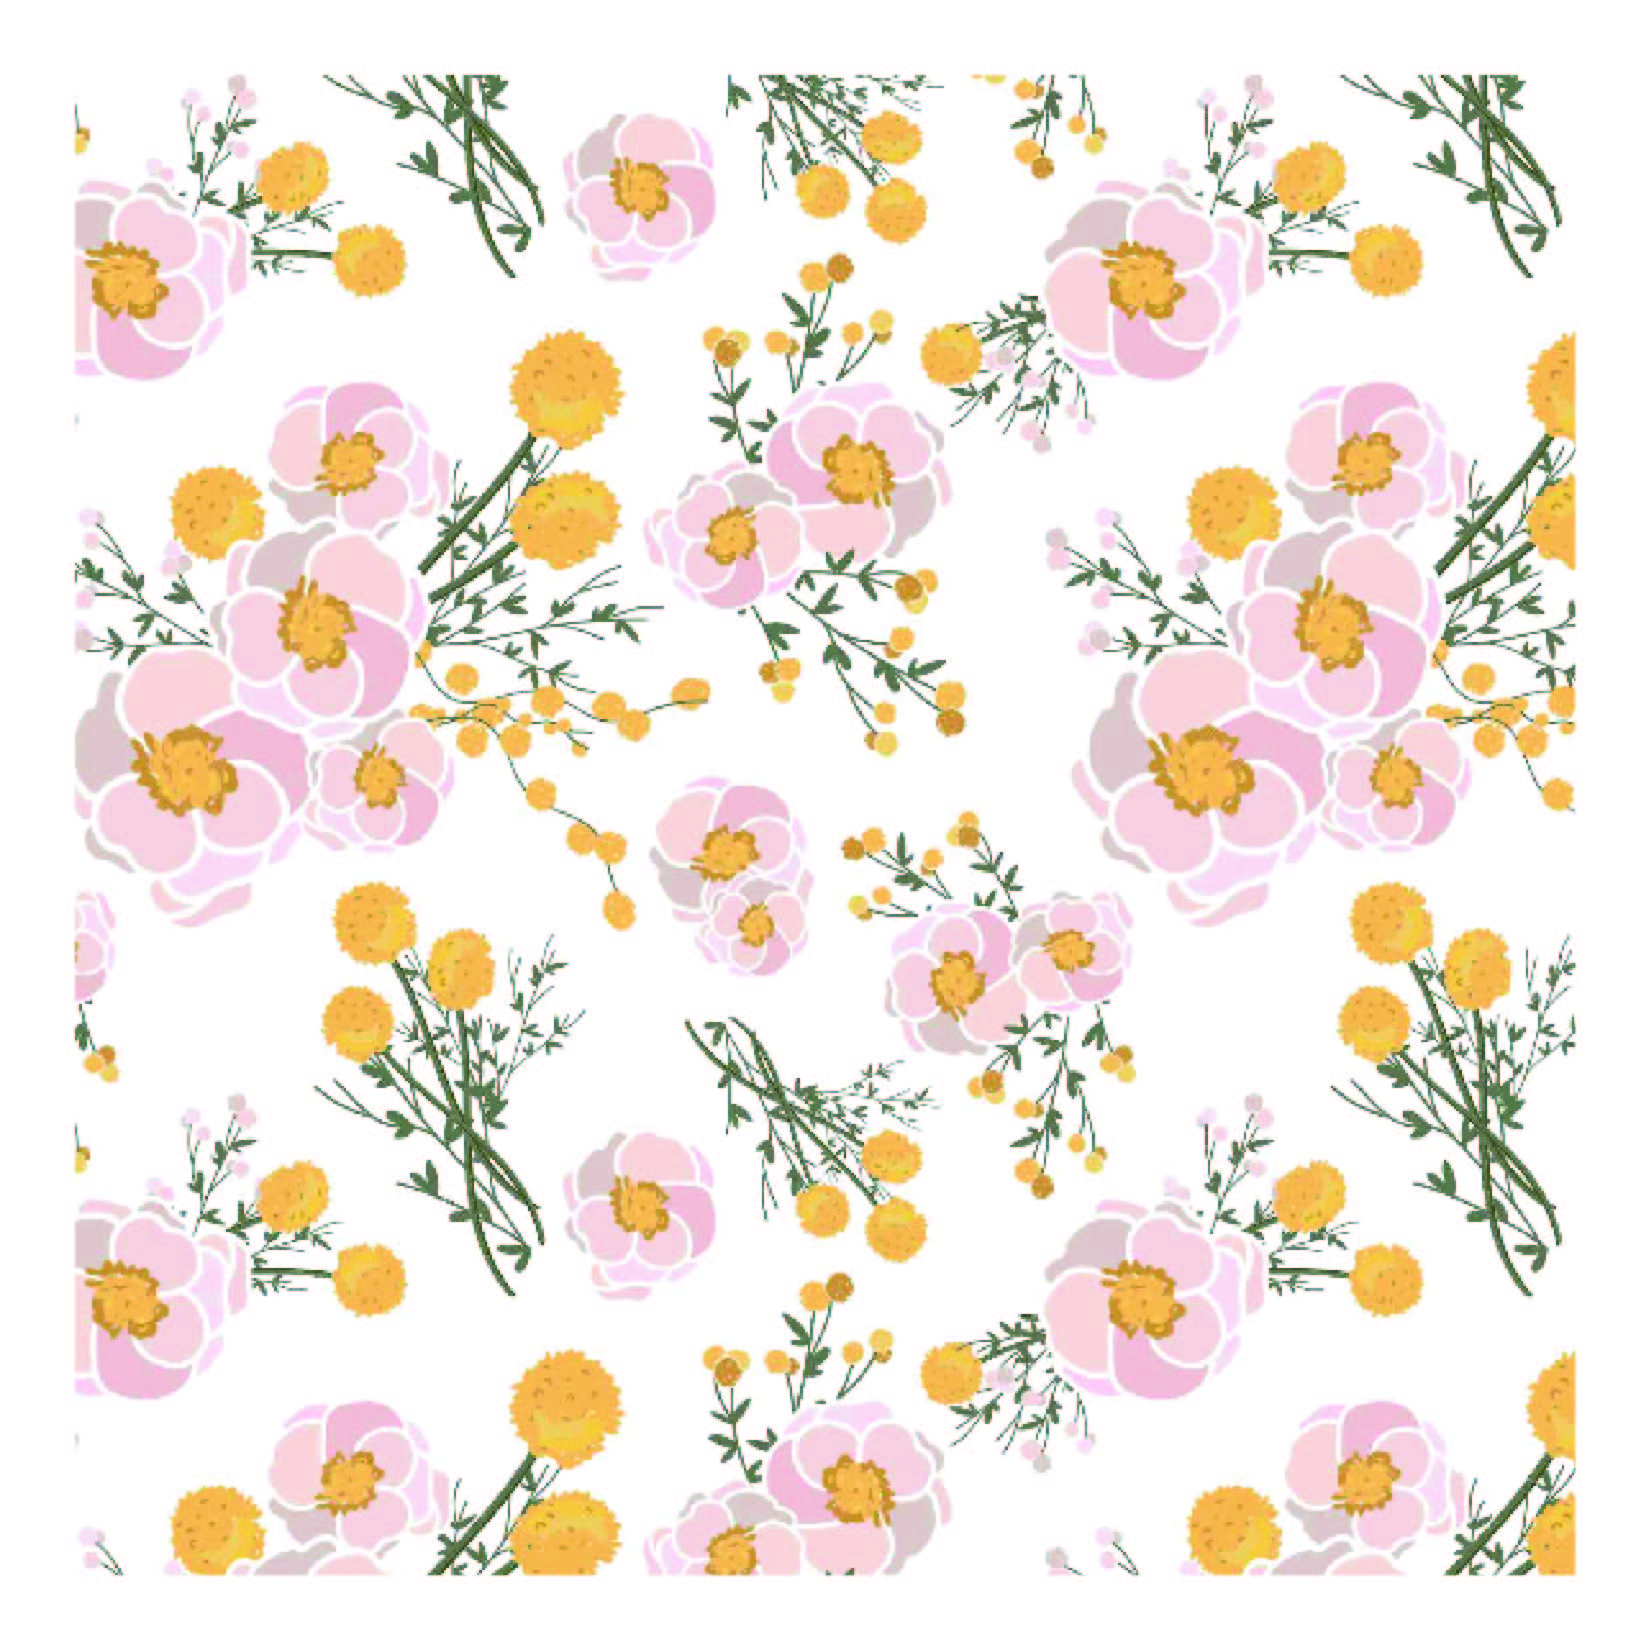 billy florals sample-01.jpg